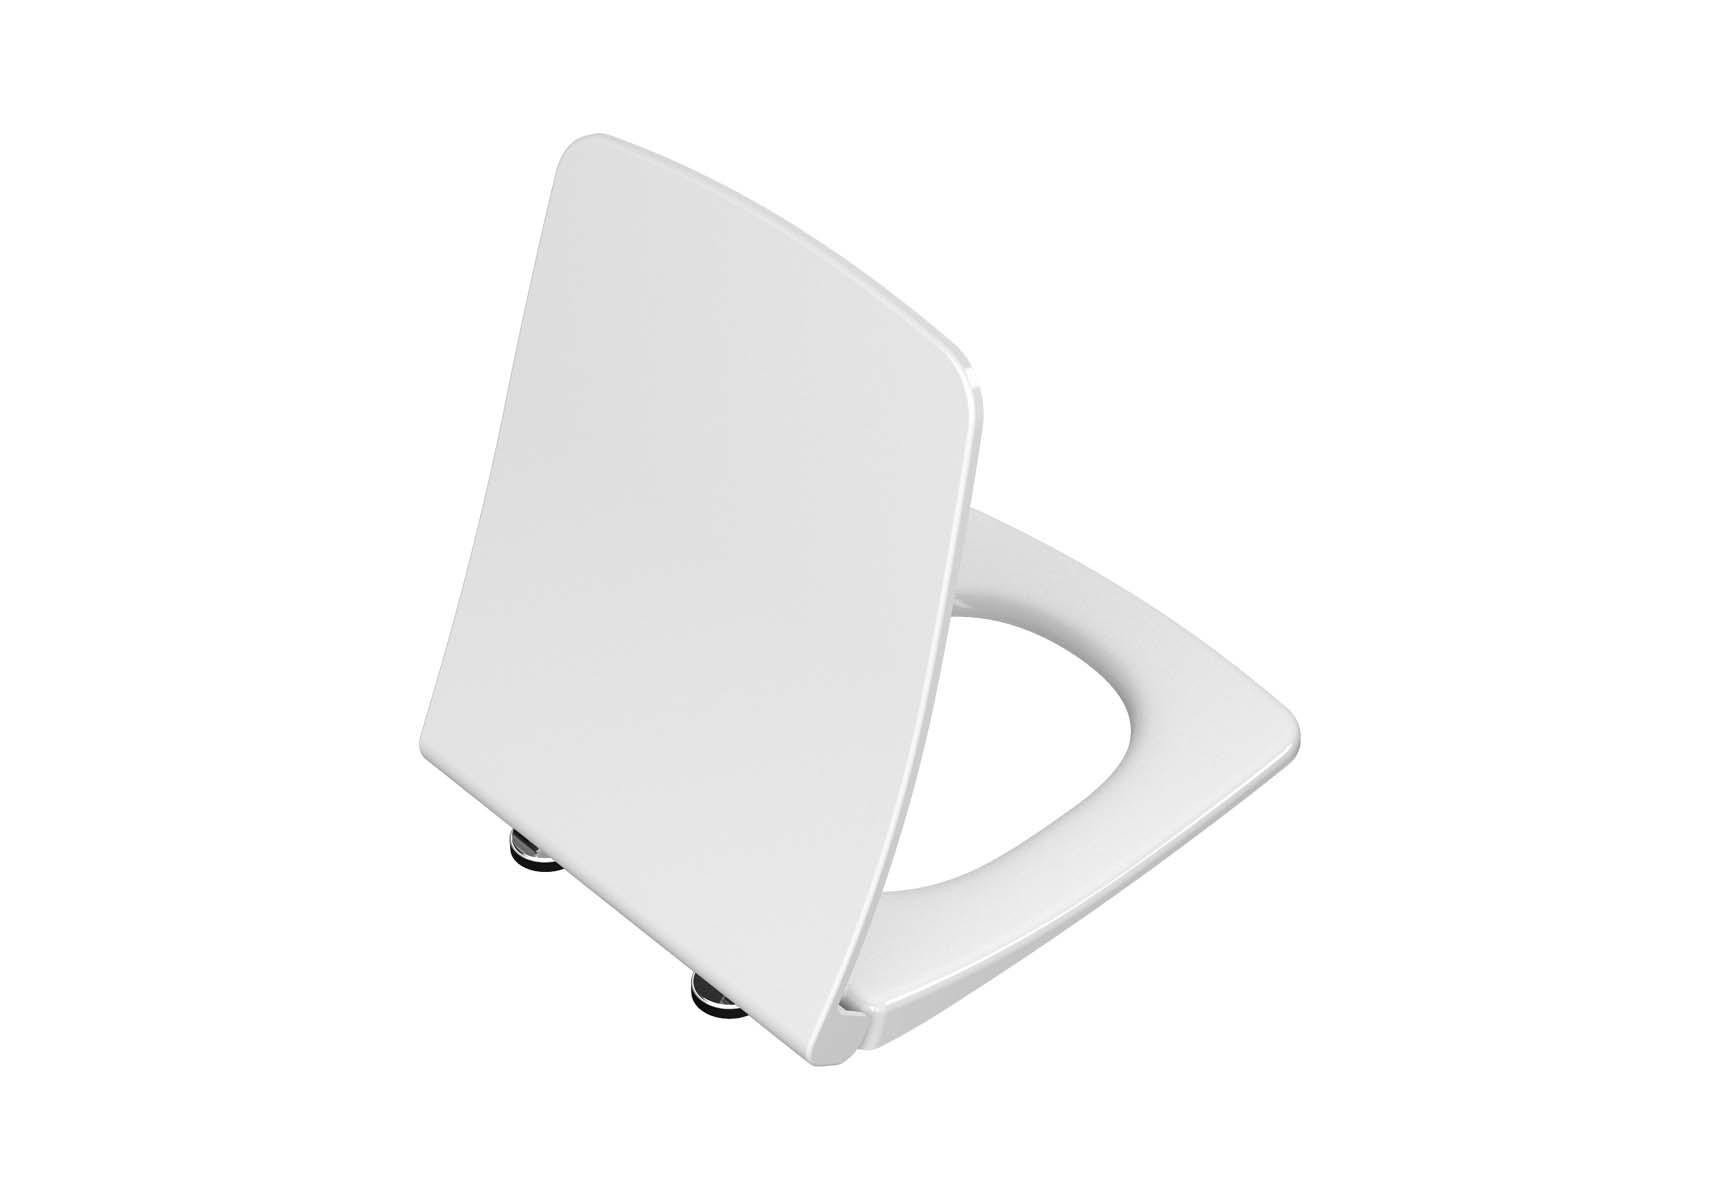 Metropole Slim Wc Seat